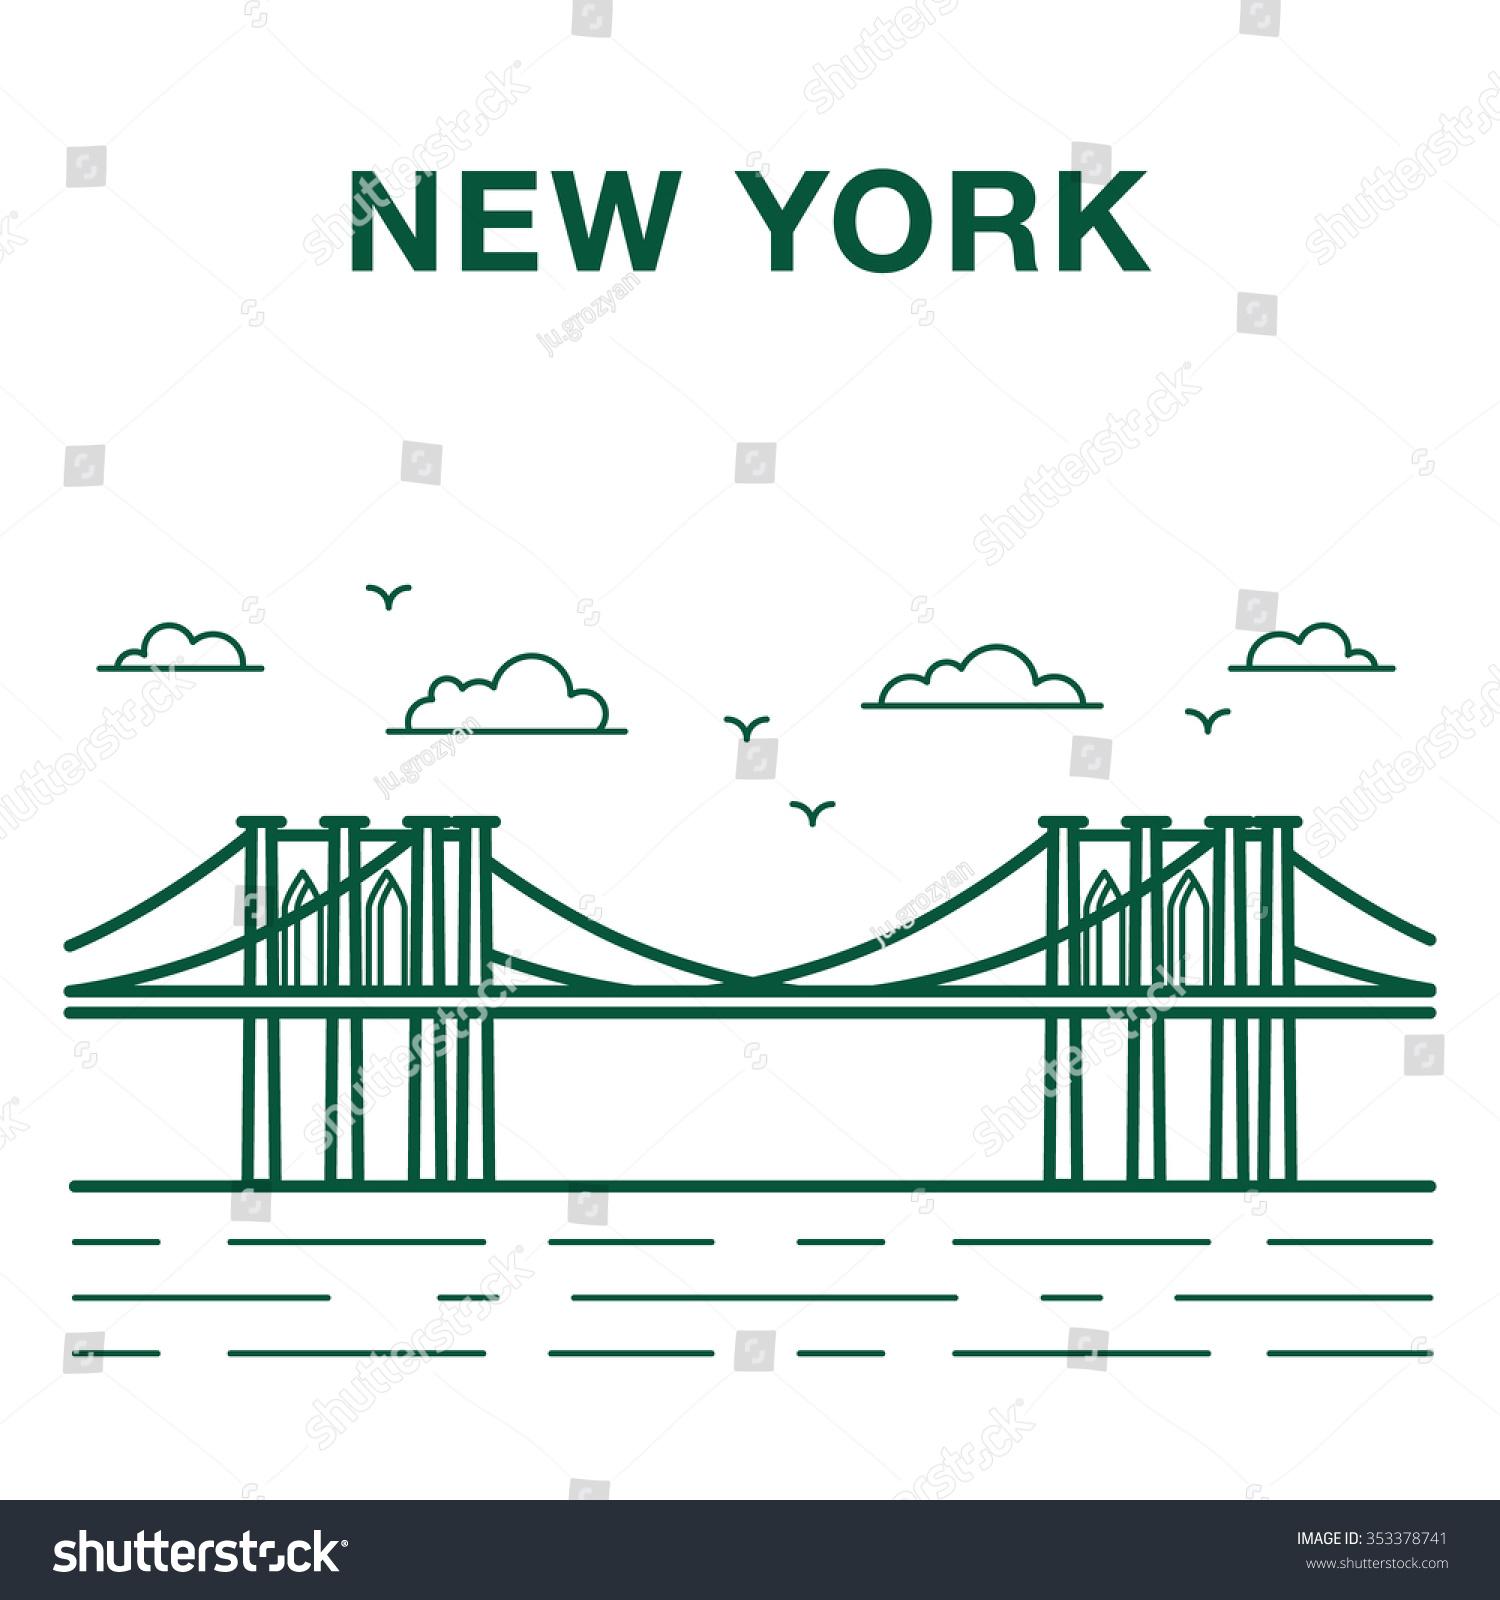 Line Art New York : Brooklyn bridge illustration made line art stock vector